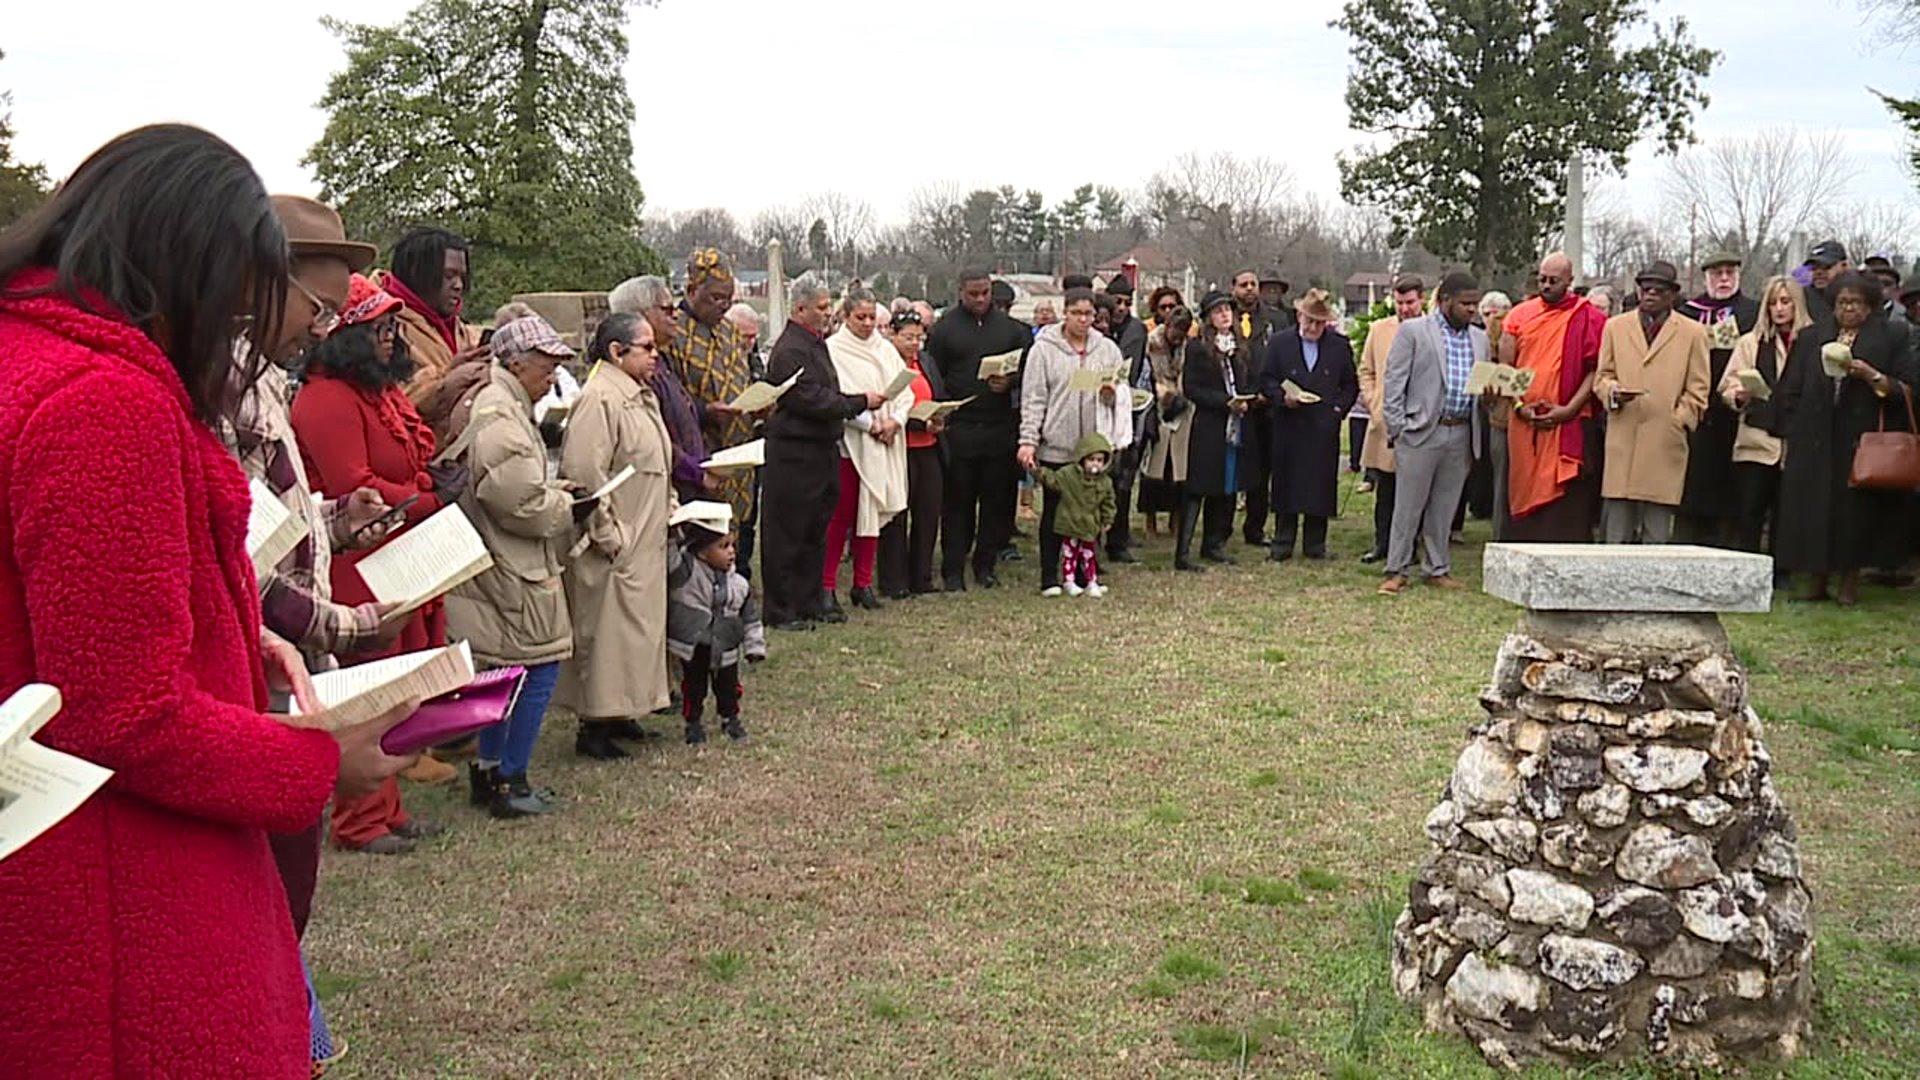 Lexington memorial service honors slaves